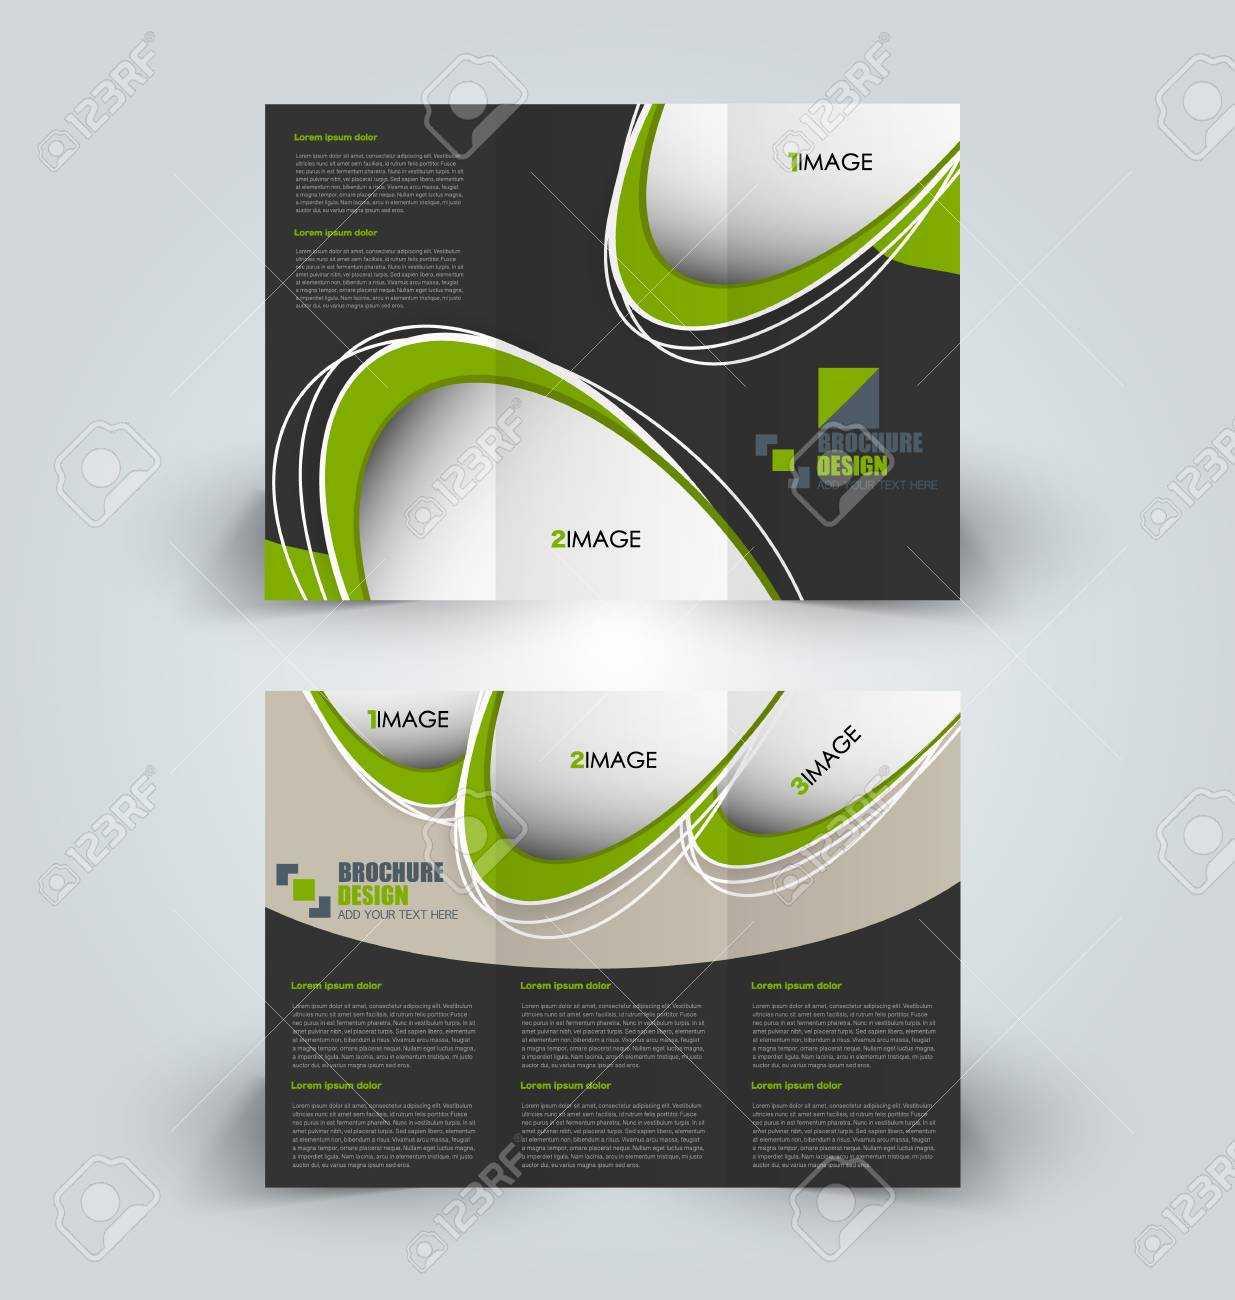 Brochure Template. Business Trifold Flyer. Creative Design Trend.. In Professional Brochure Design Templates